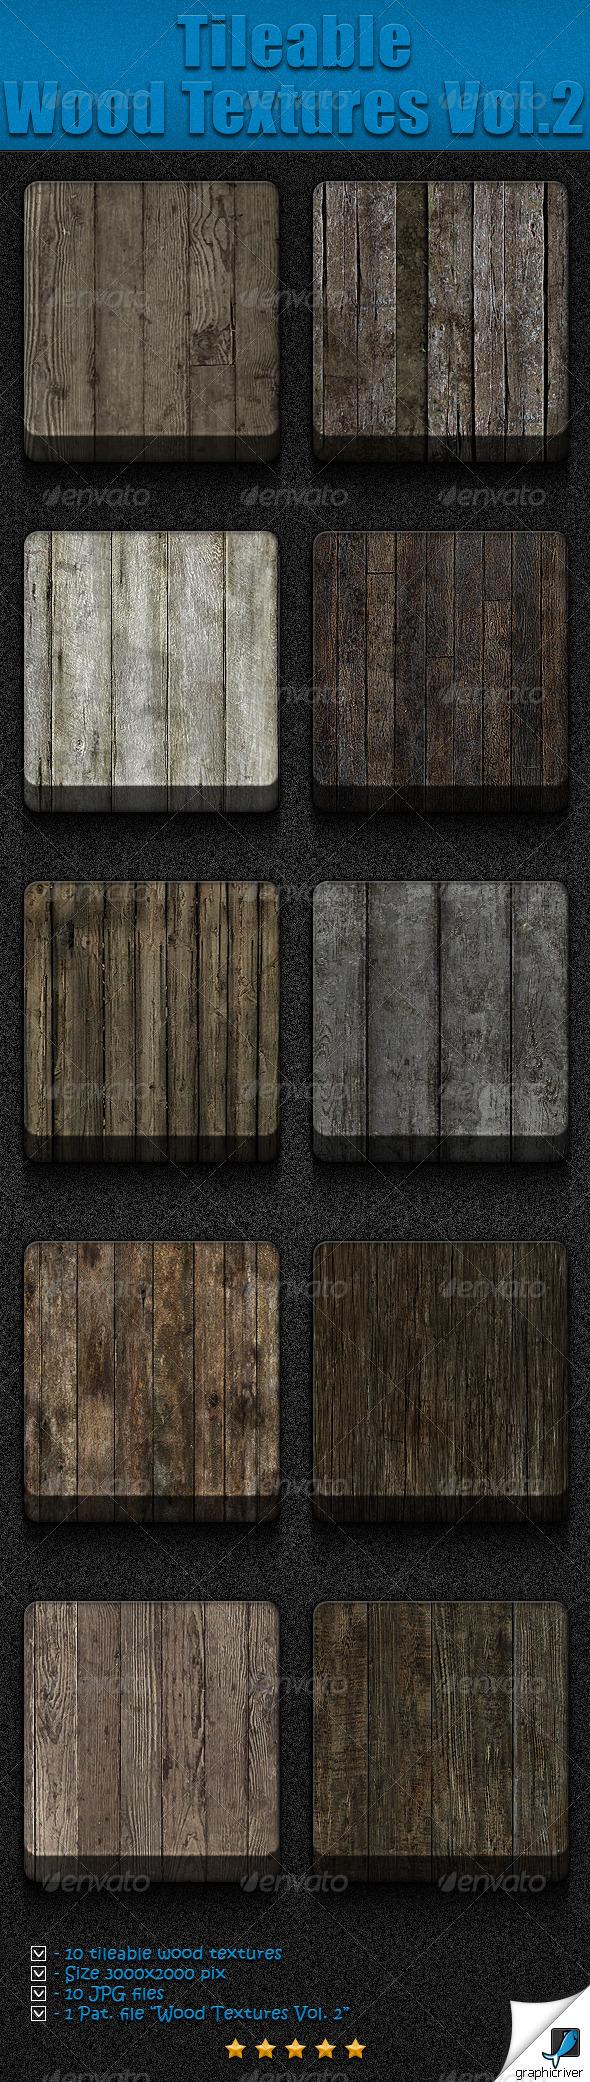 Tileable Wood Textures Vol 2